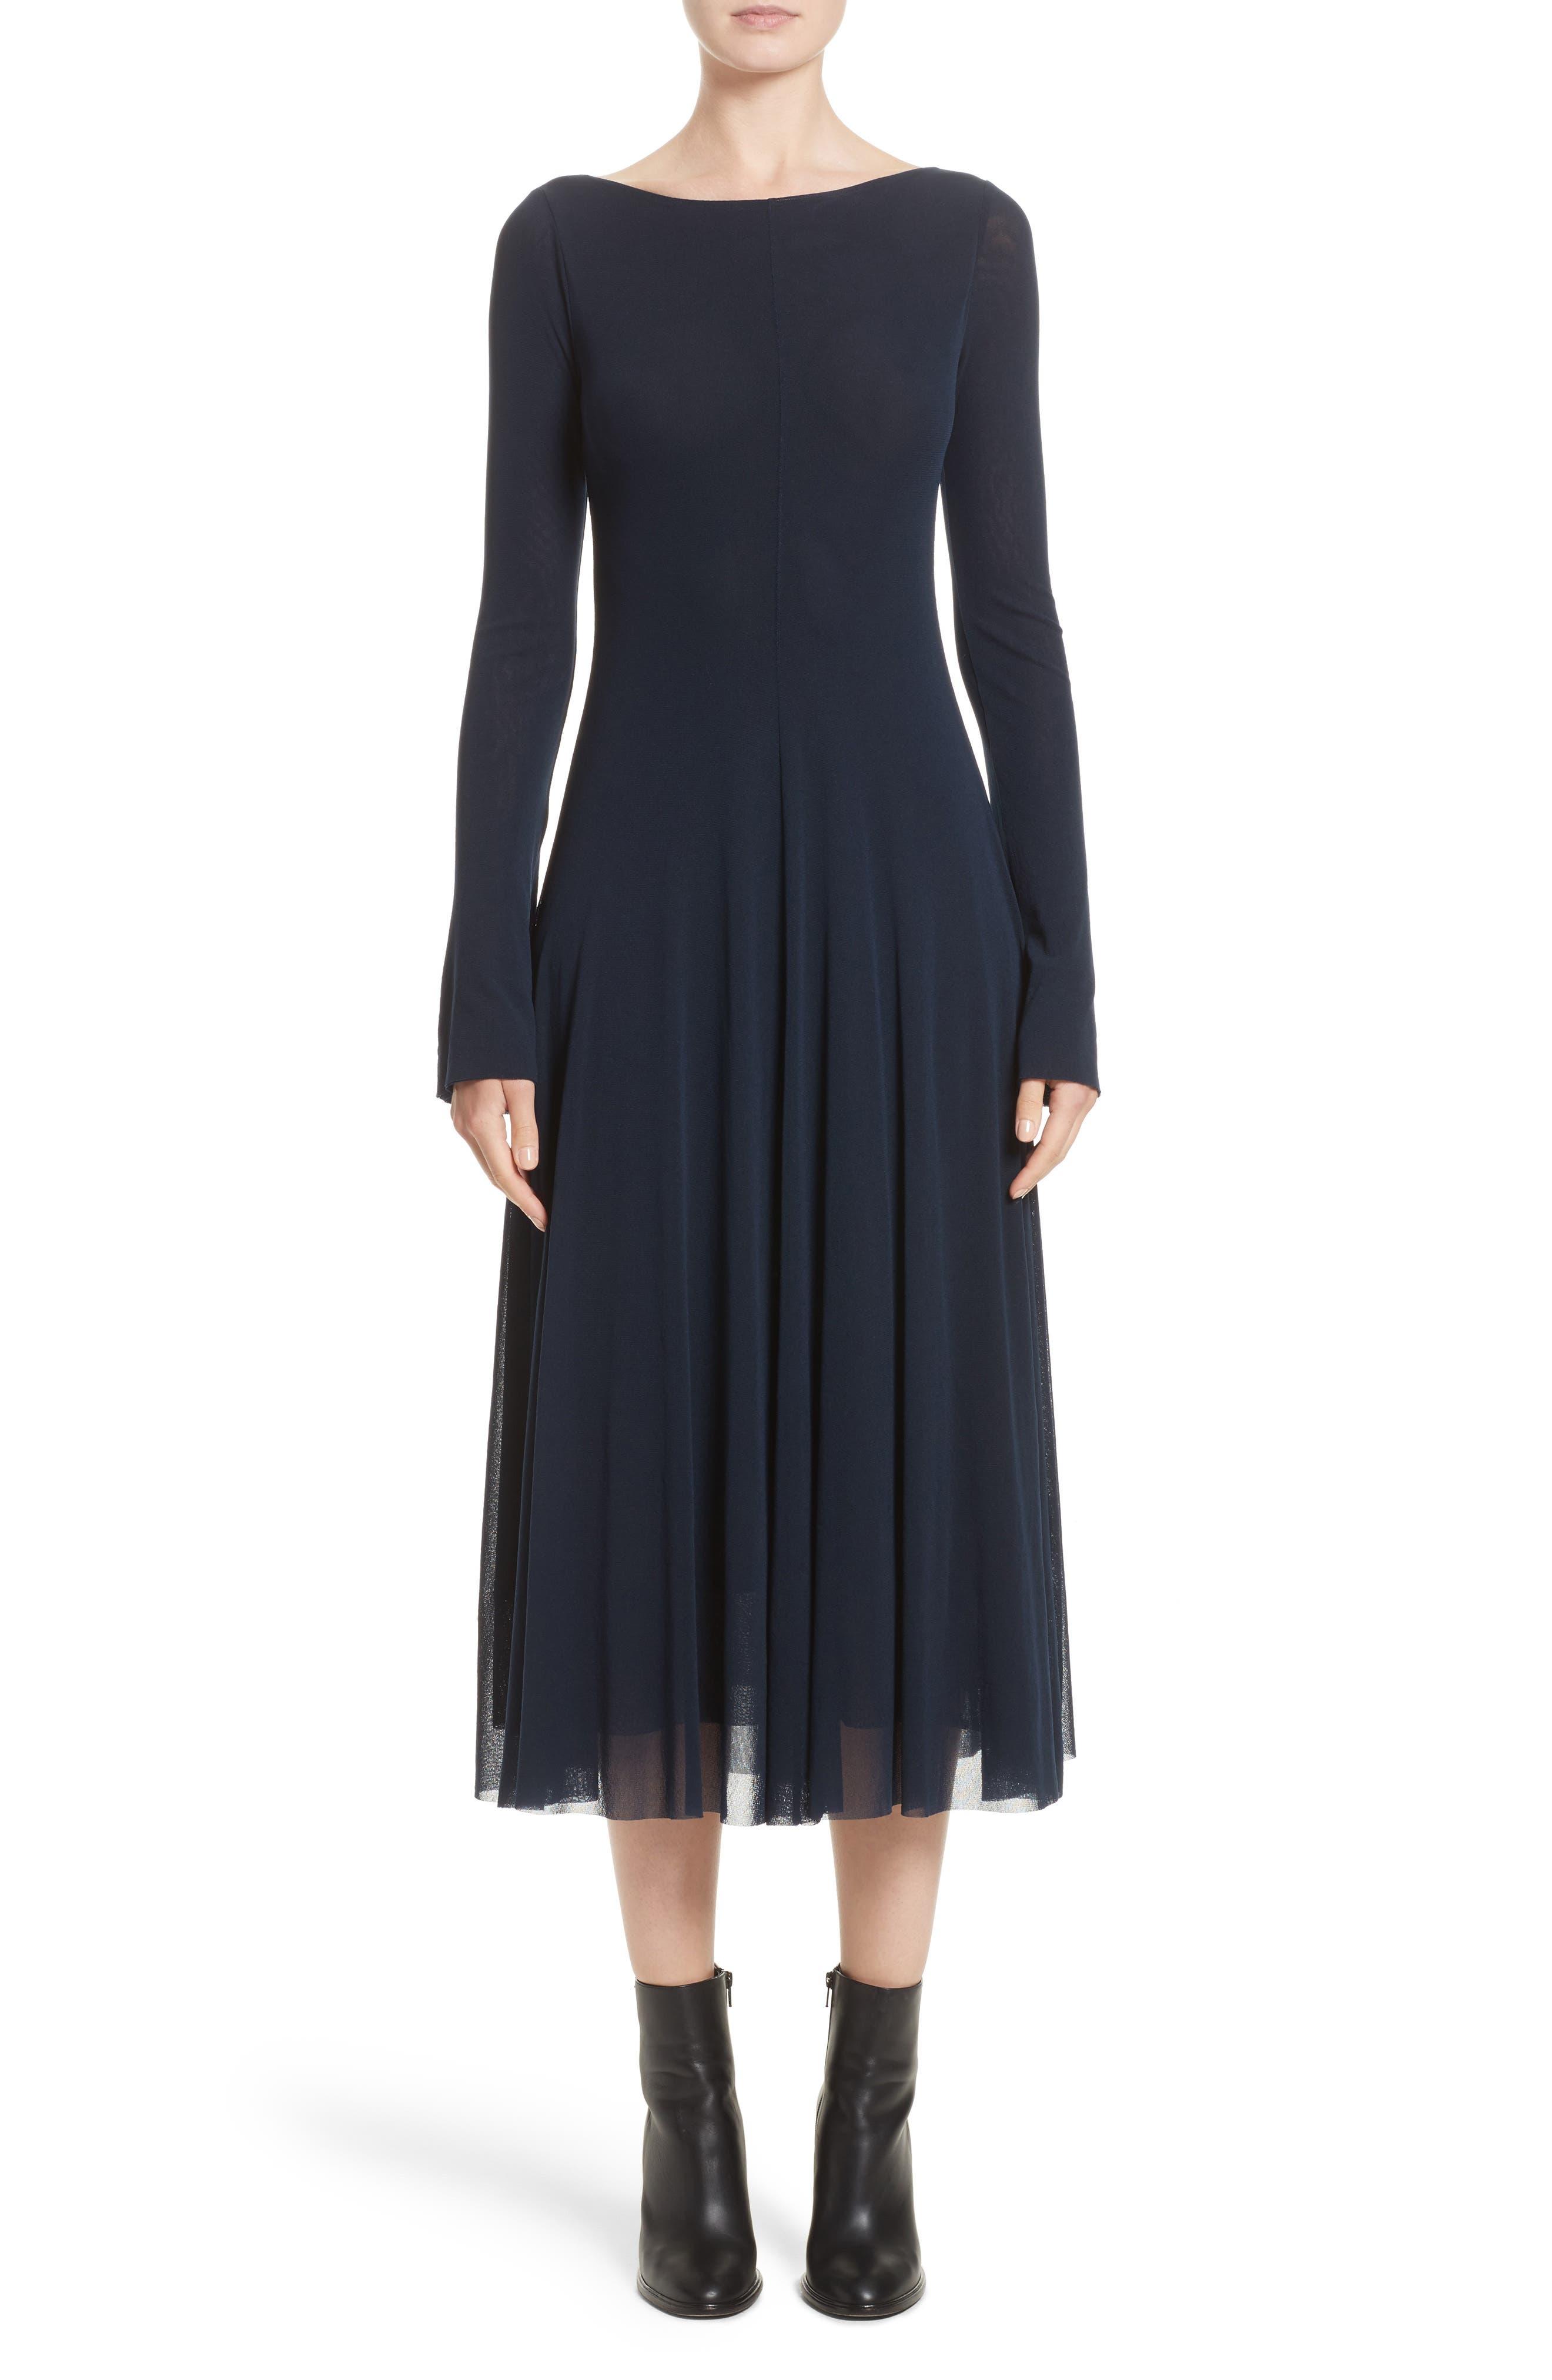 Alternate Image 1 Selected - Fuzzi Reversible Tulle Dress